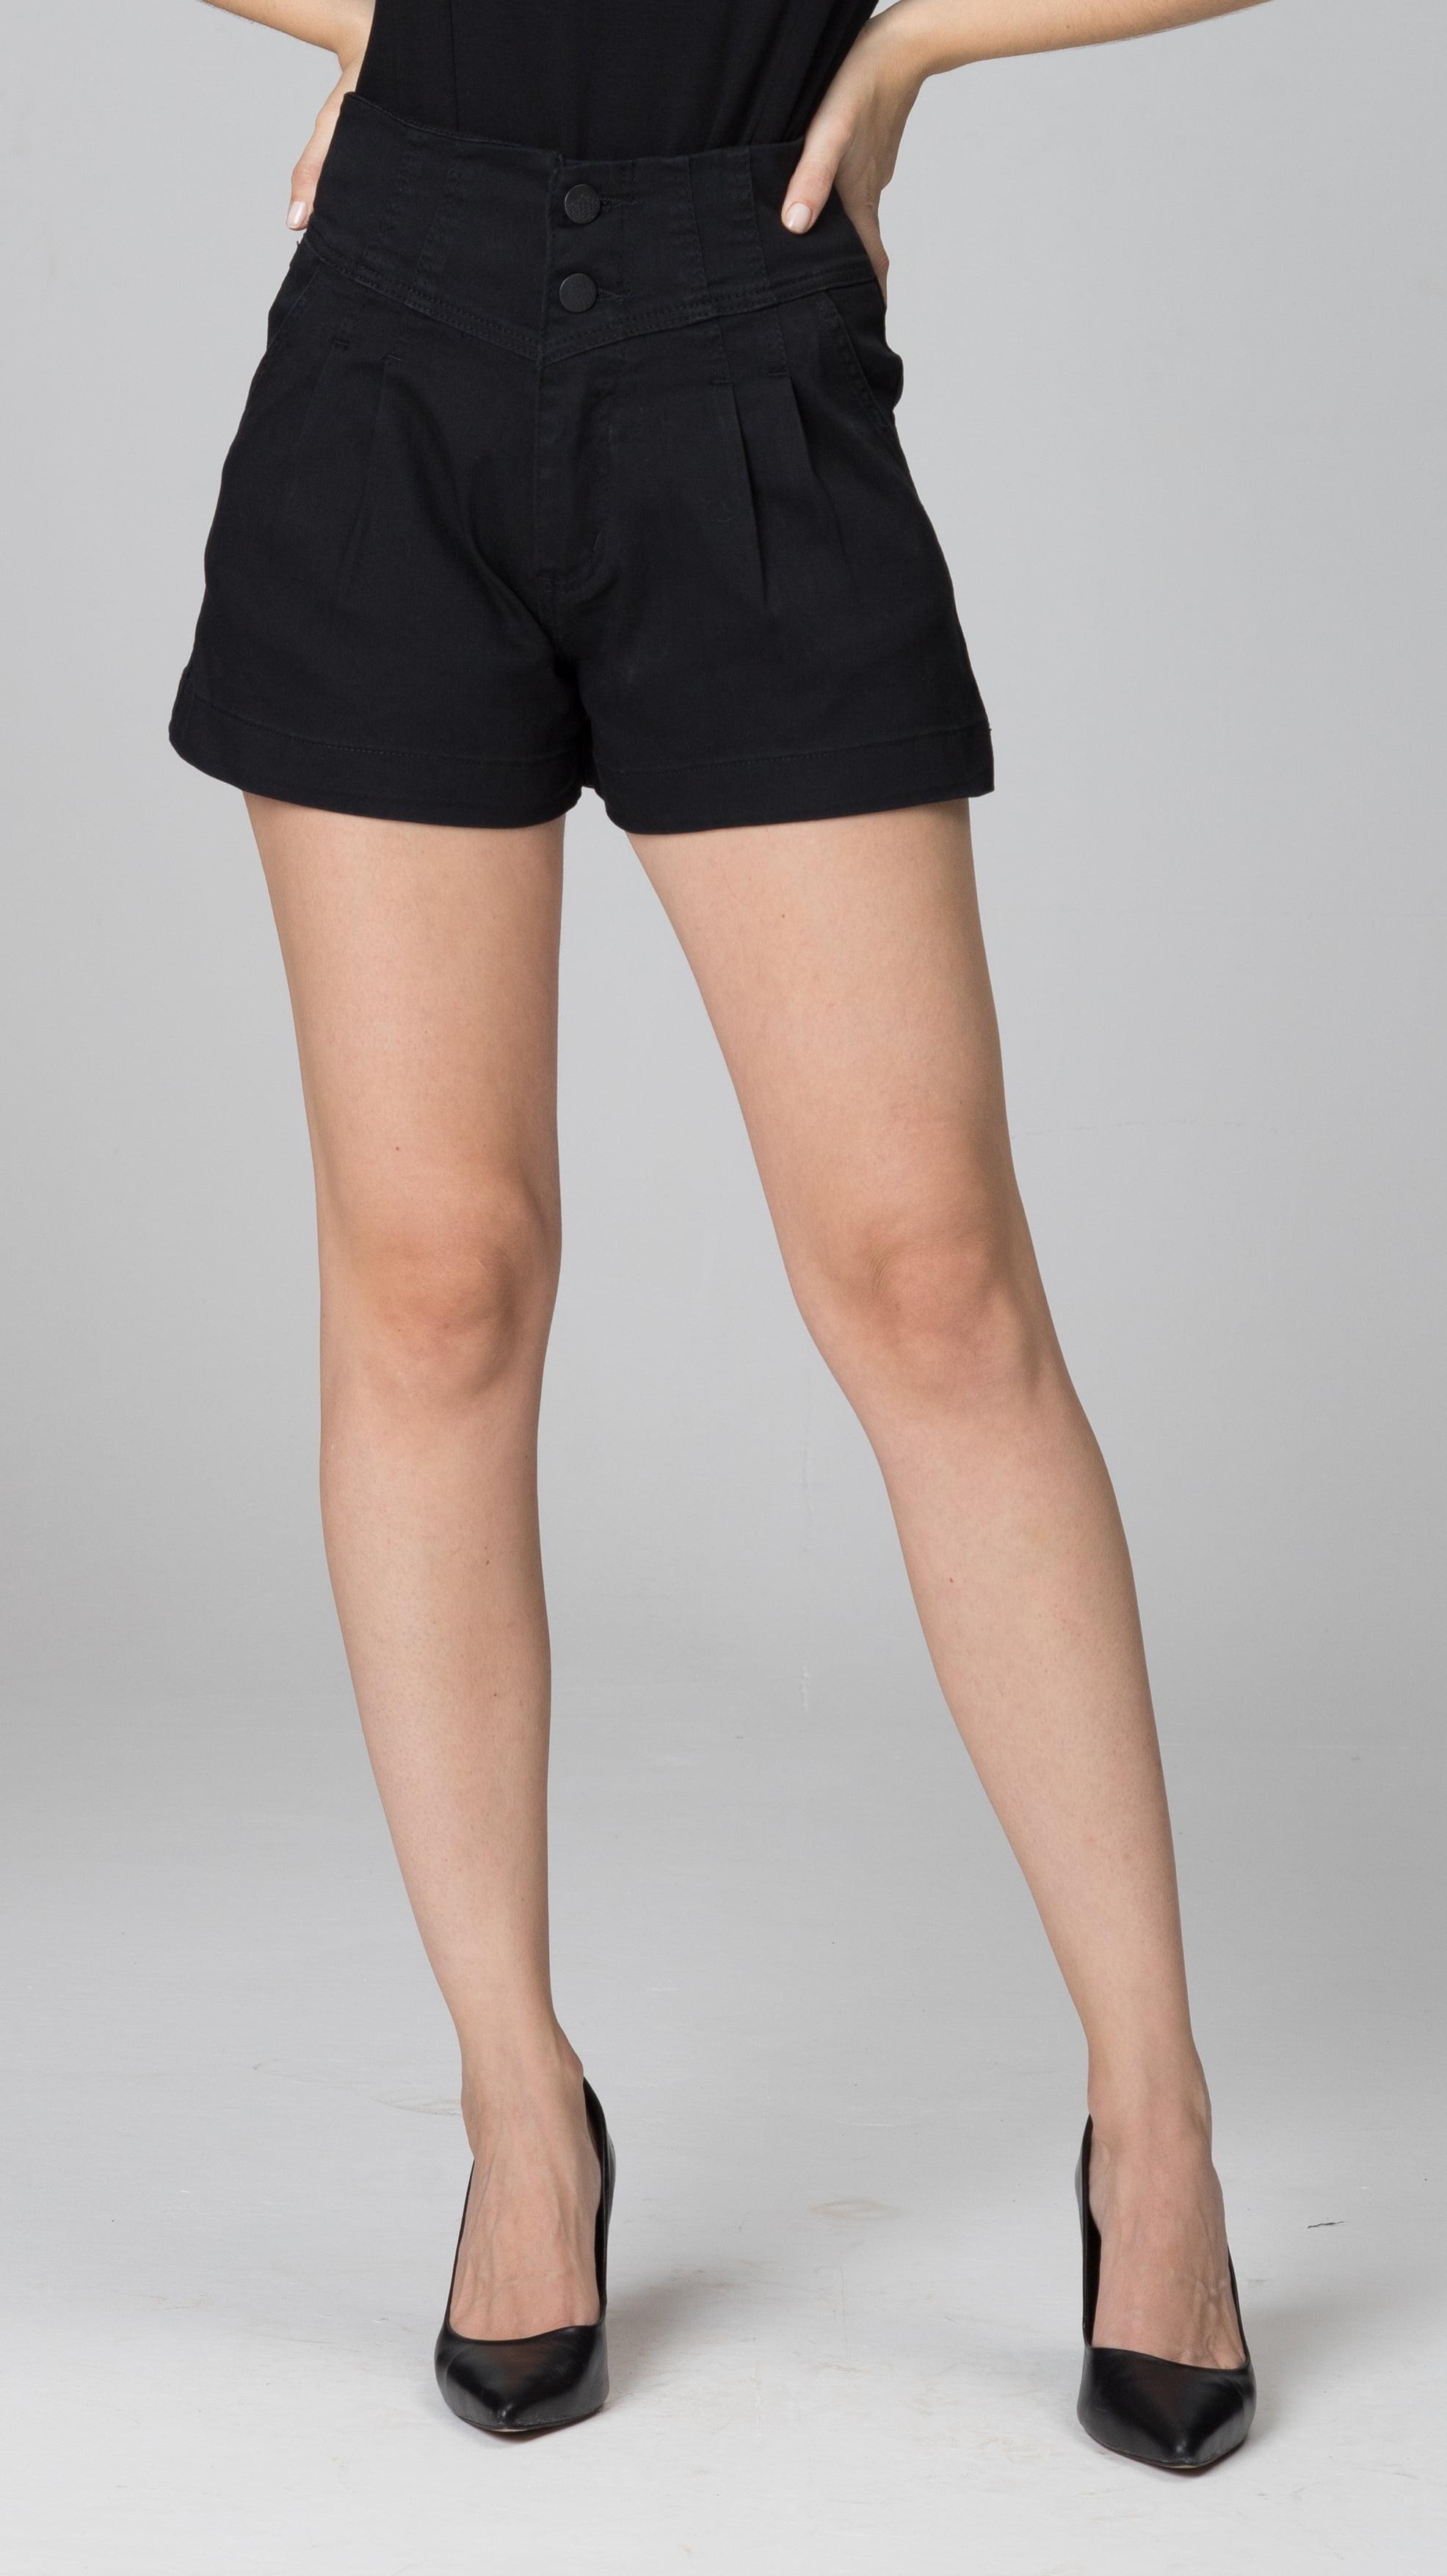 Shorts Preto Feminino F2020409